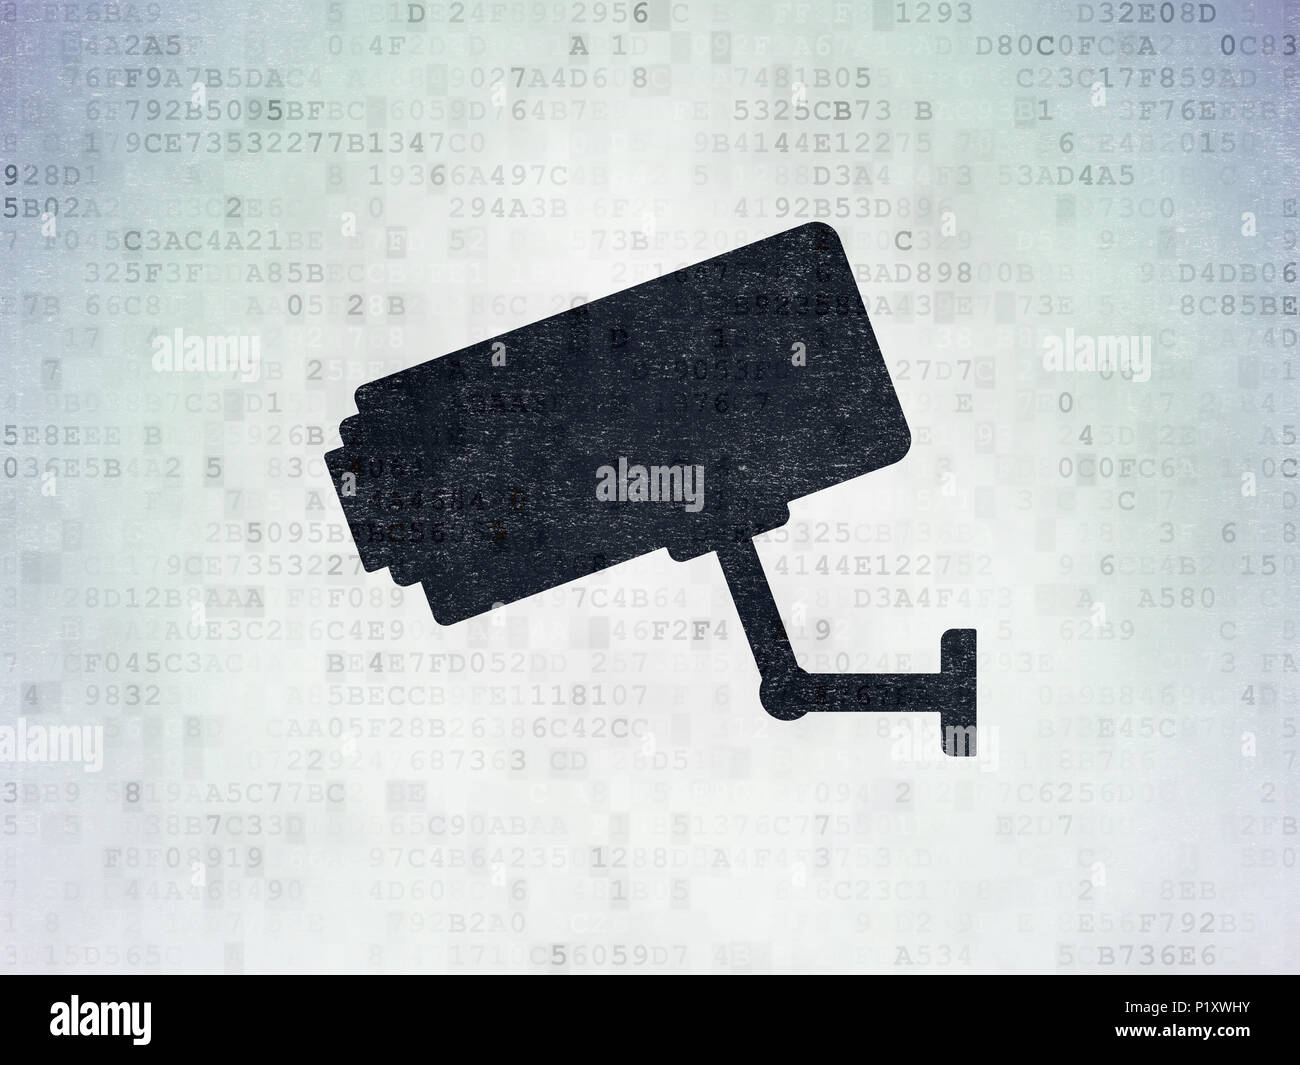 Privacy Concept Cctv Camera Cctv Stock Photos & Privacy